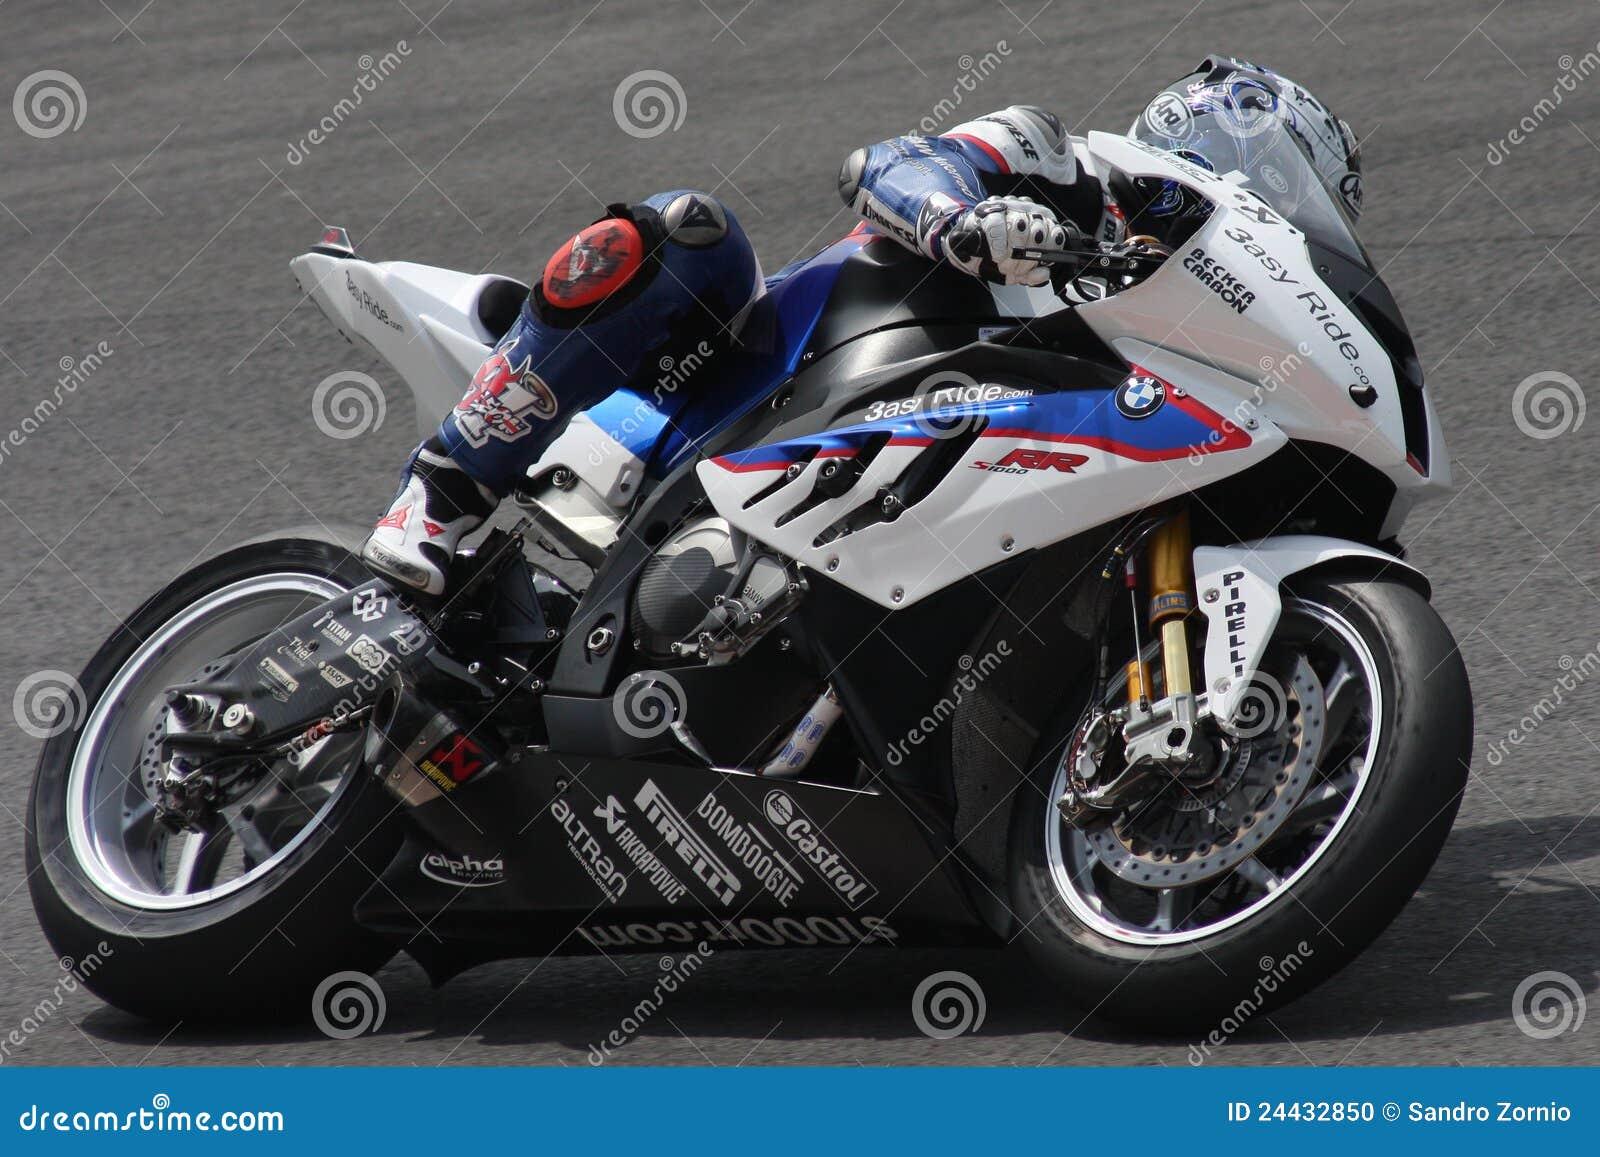 Leon Haslam BMW S1000 RR - BMW Motorrad Motorsport